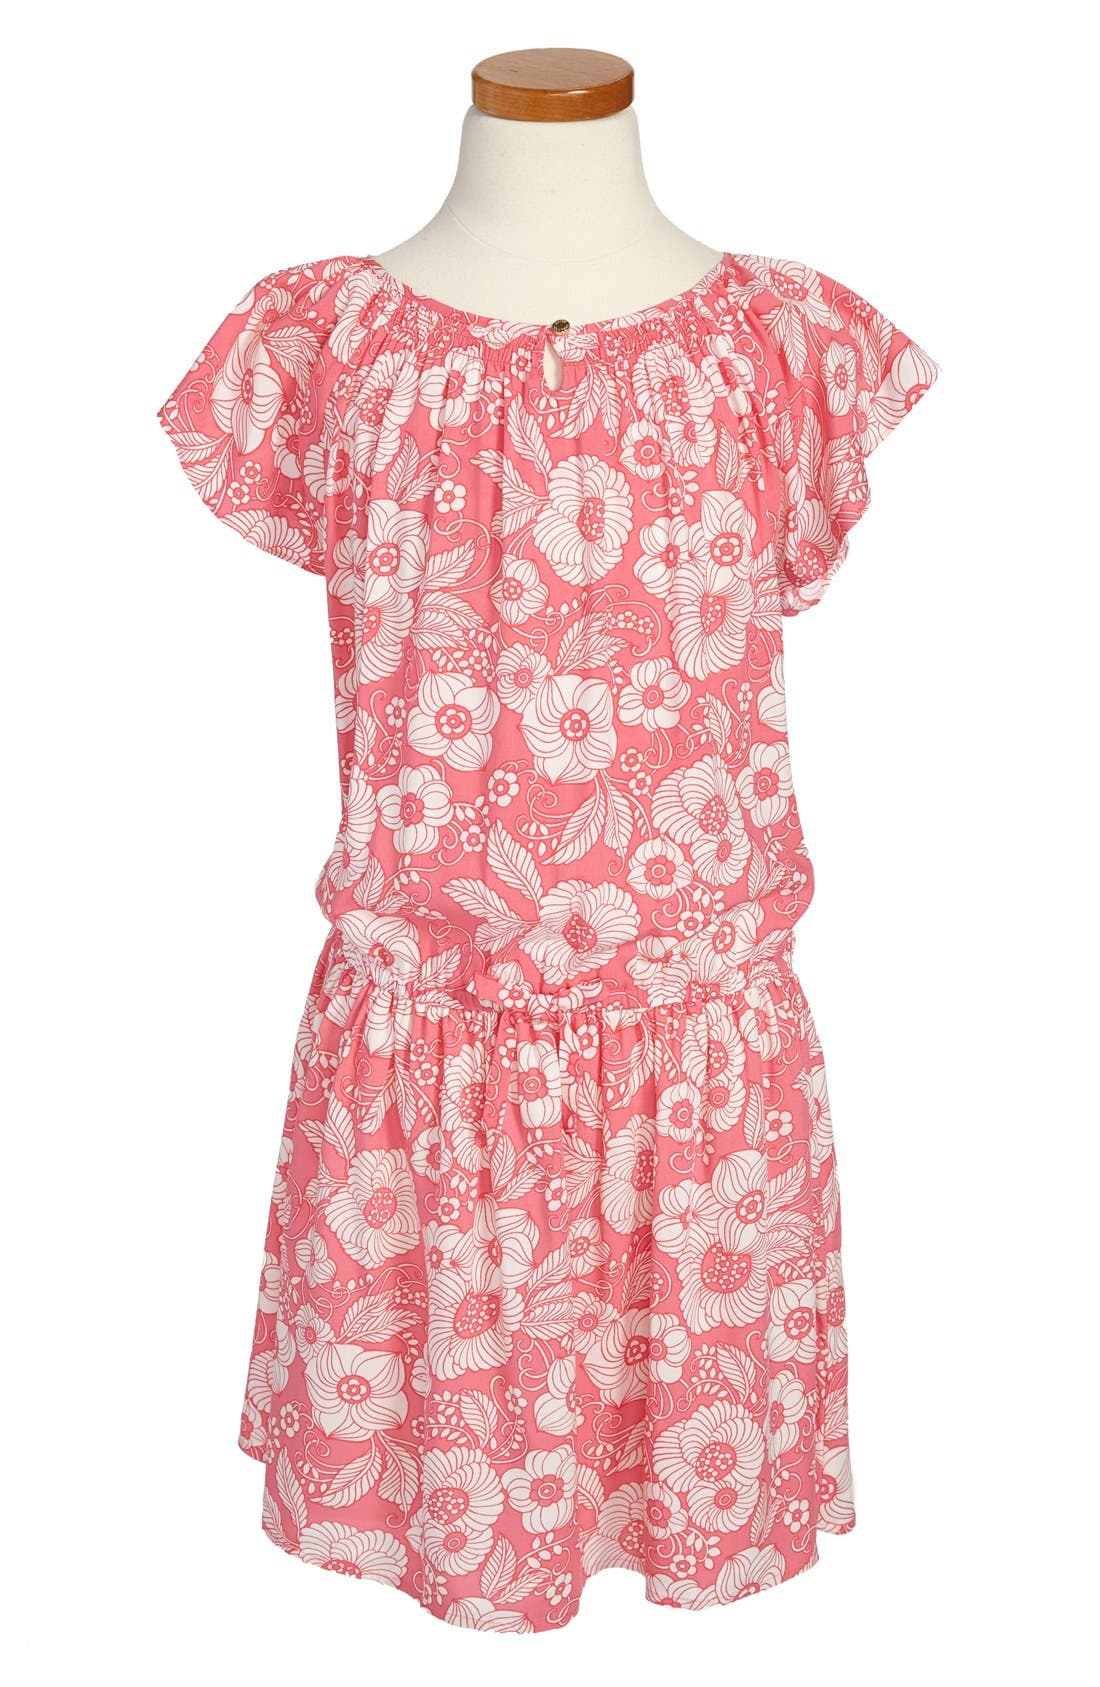 Main Image - Juicy Couture 'Vanity Scroll' Dress (Little Girls & Big Girls)